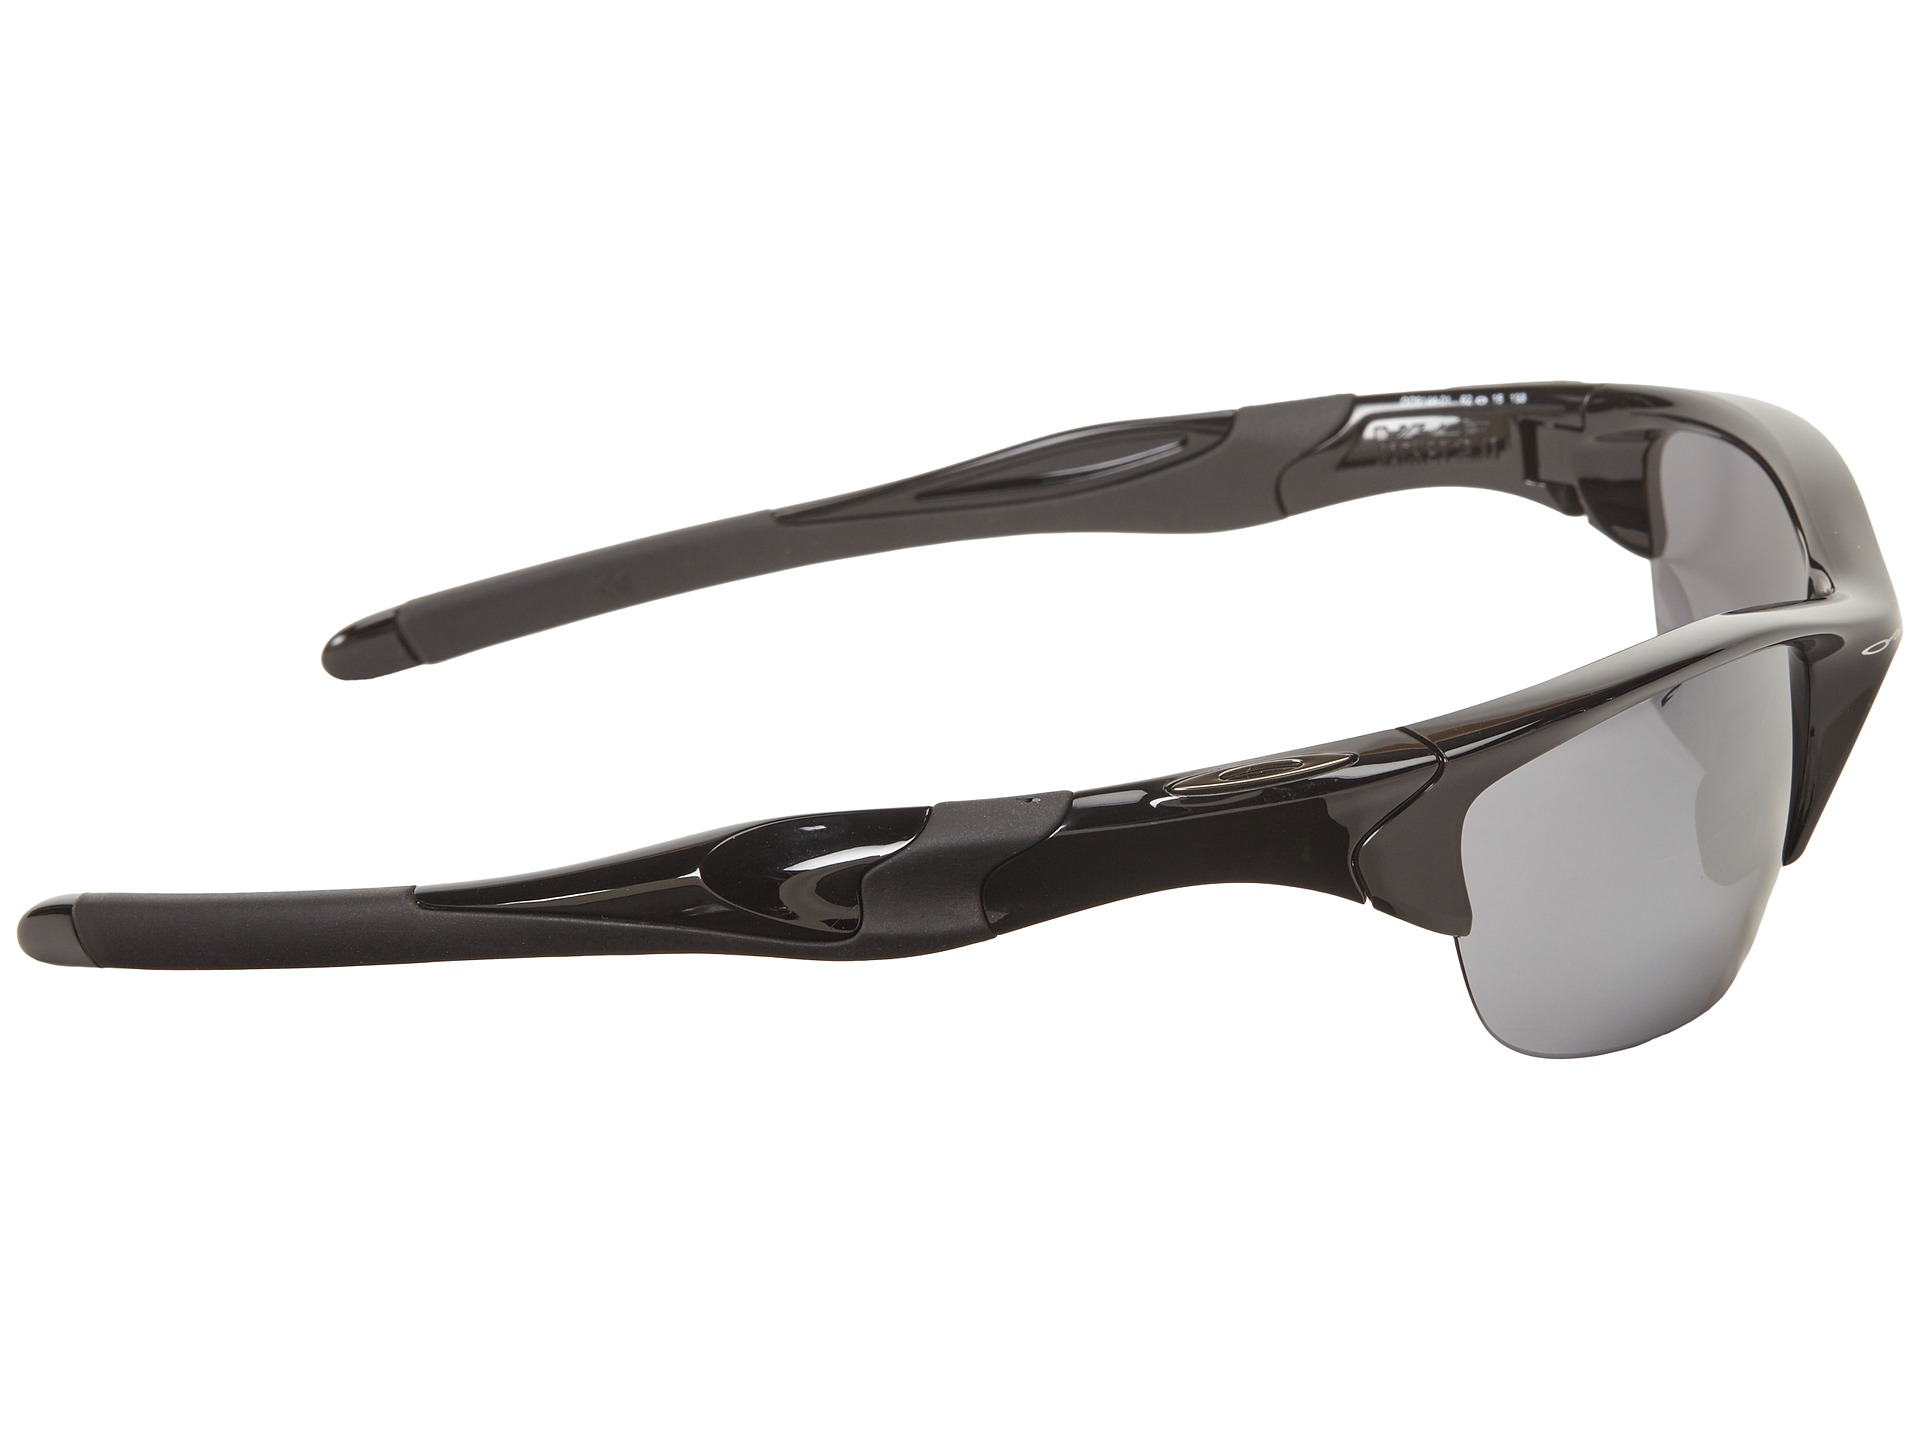 5eeb719ddfe Costco Glasses Warranty Policy